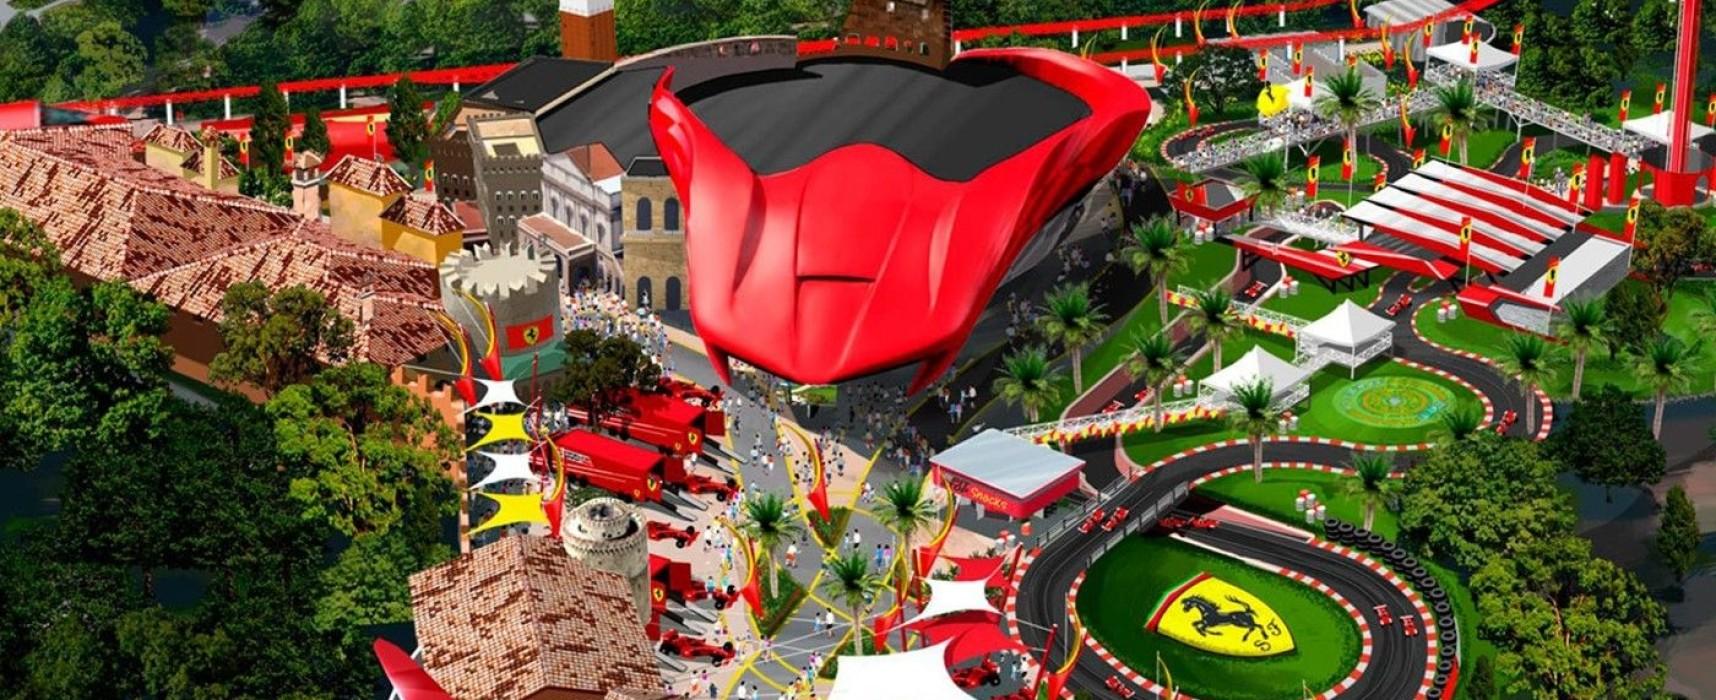 Offerta Eures: Retail Manager Ferrari Land a TARRAGONA (Spagna)